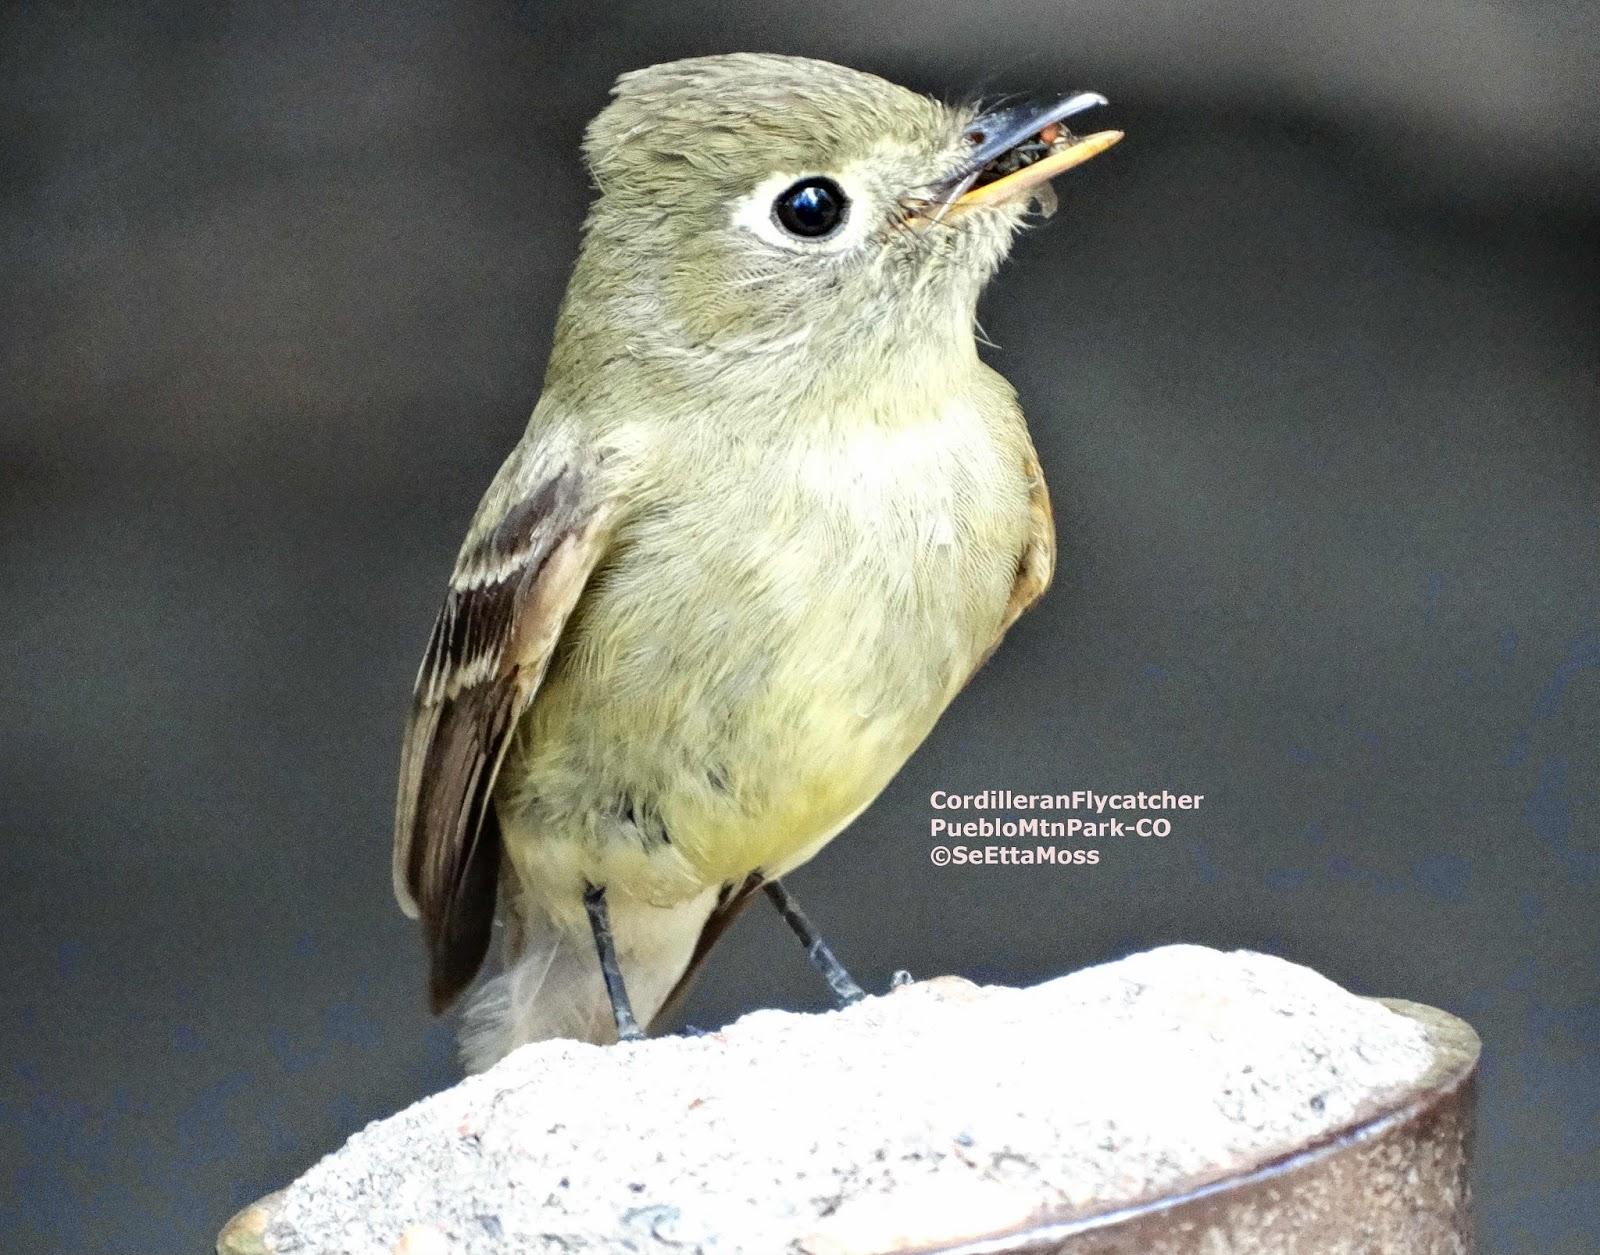 Cordilleran Flycatcher Flying